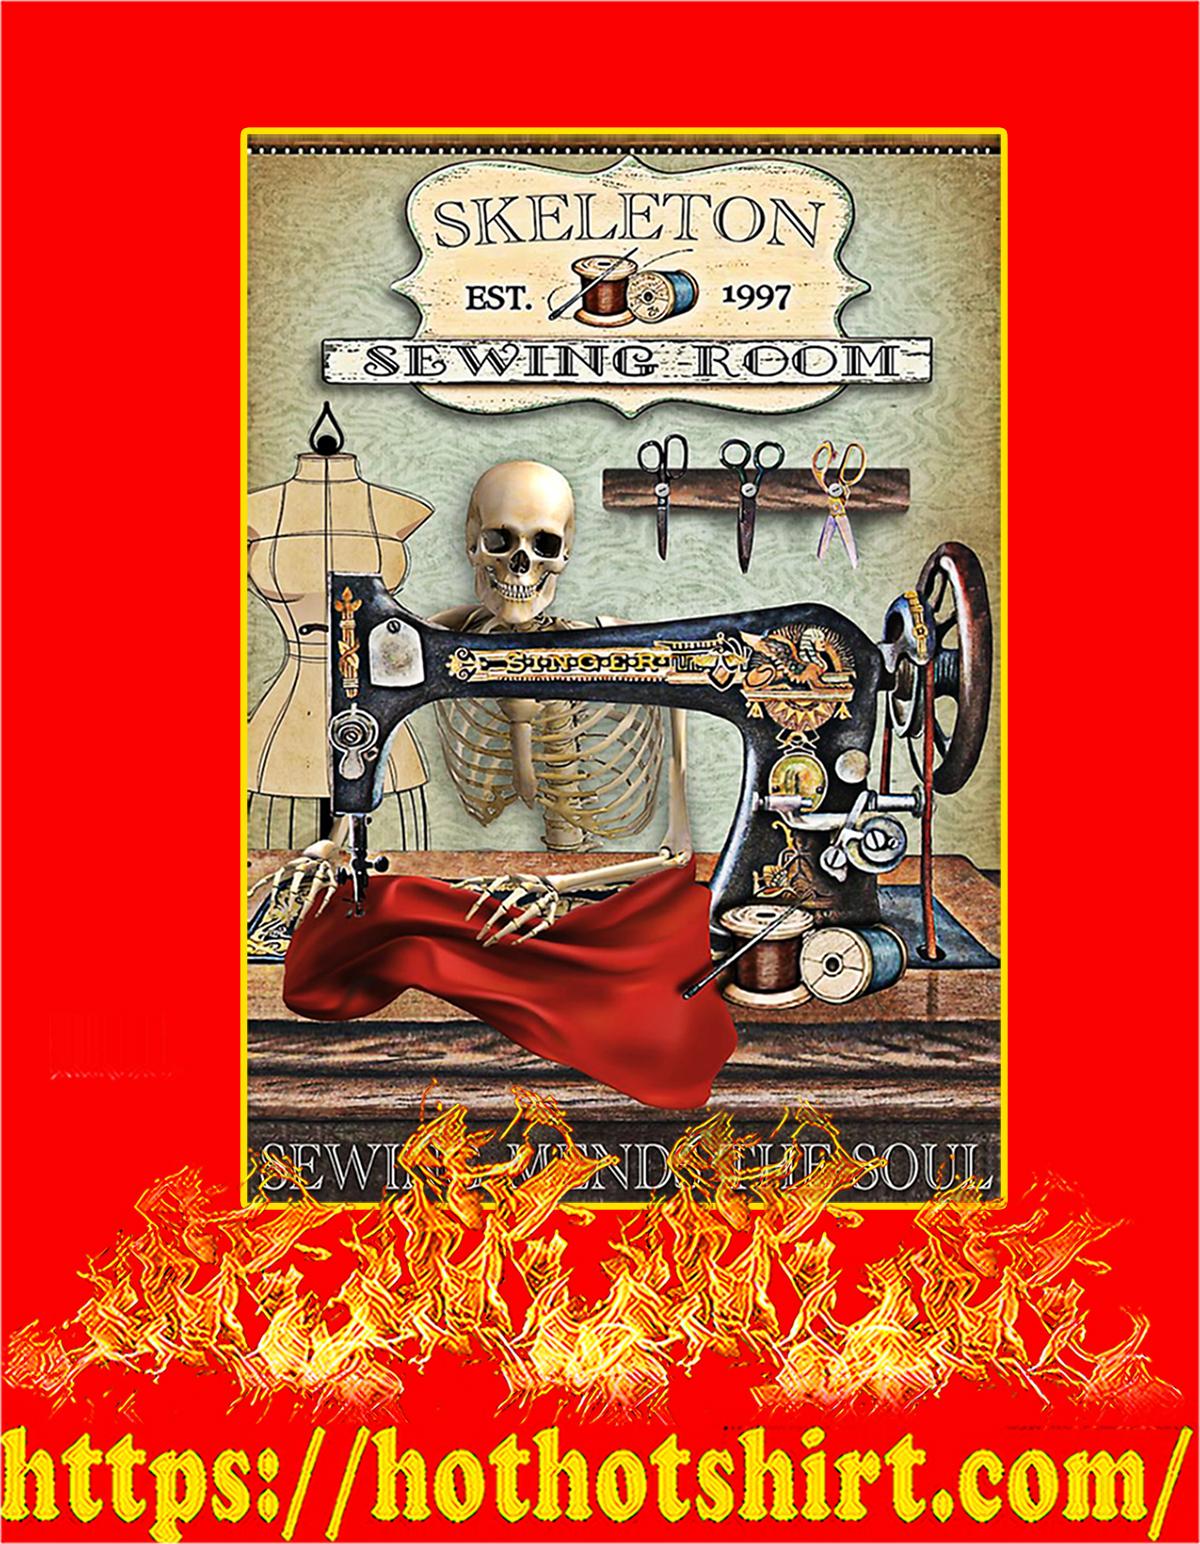 Skeleton sewing room poster